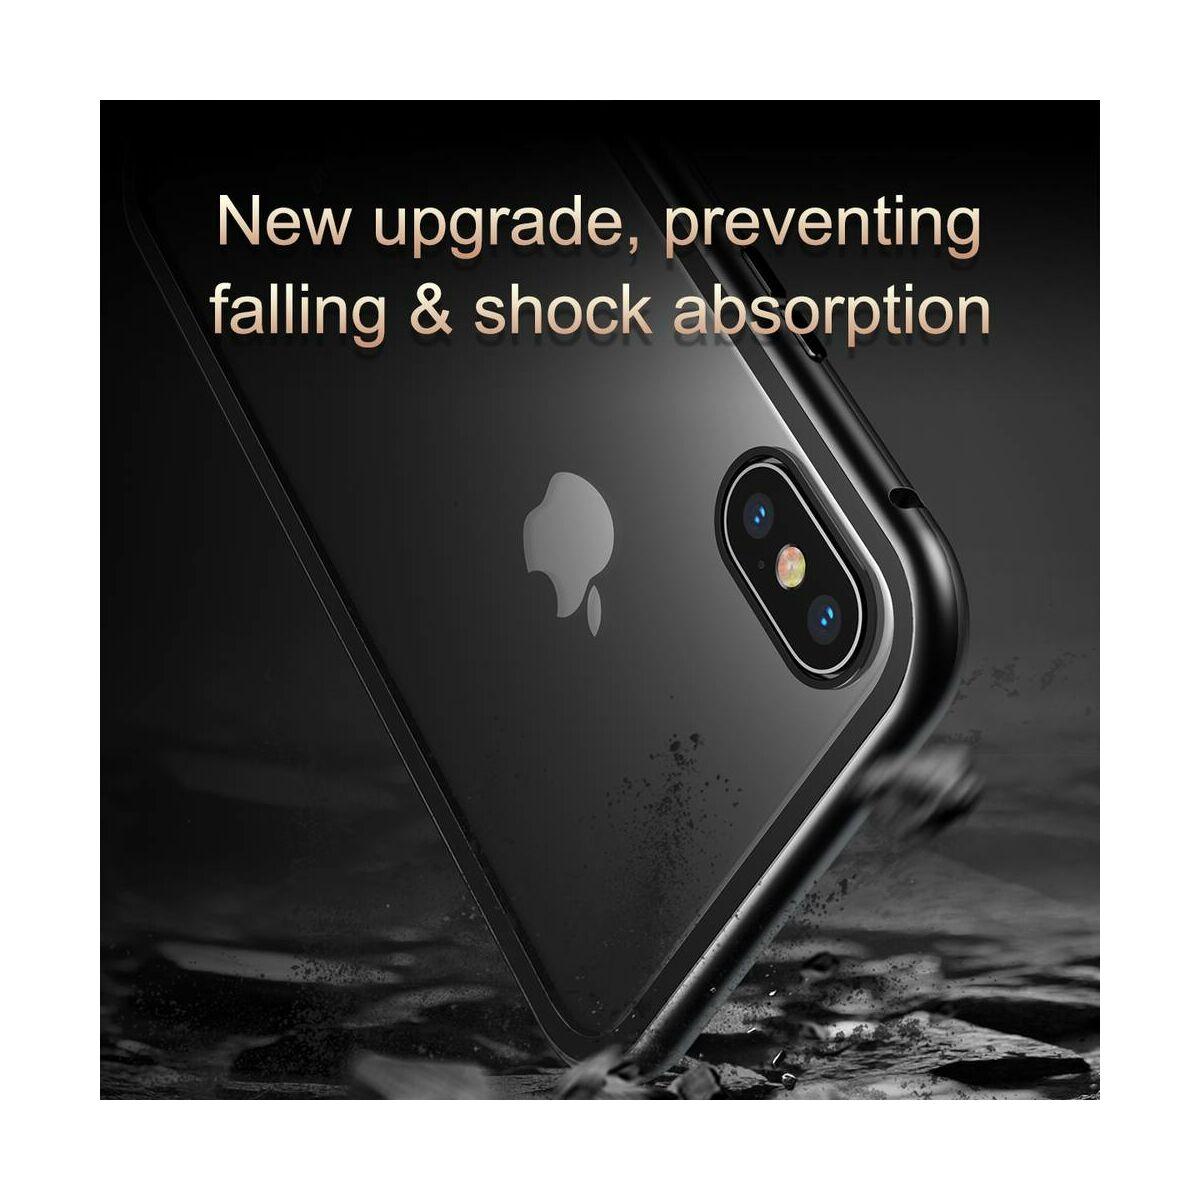 Baseus iPhone XS Max tok, Magnetite hardware, mágneses, fekete (WIAPIPH65-CS01)